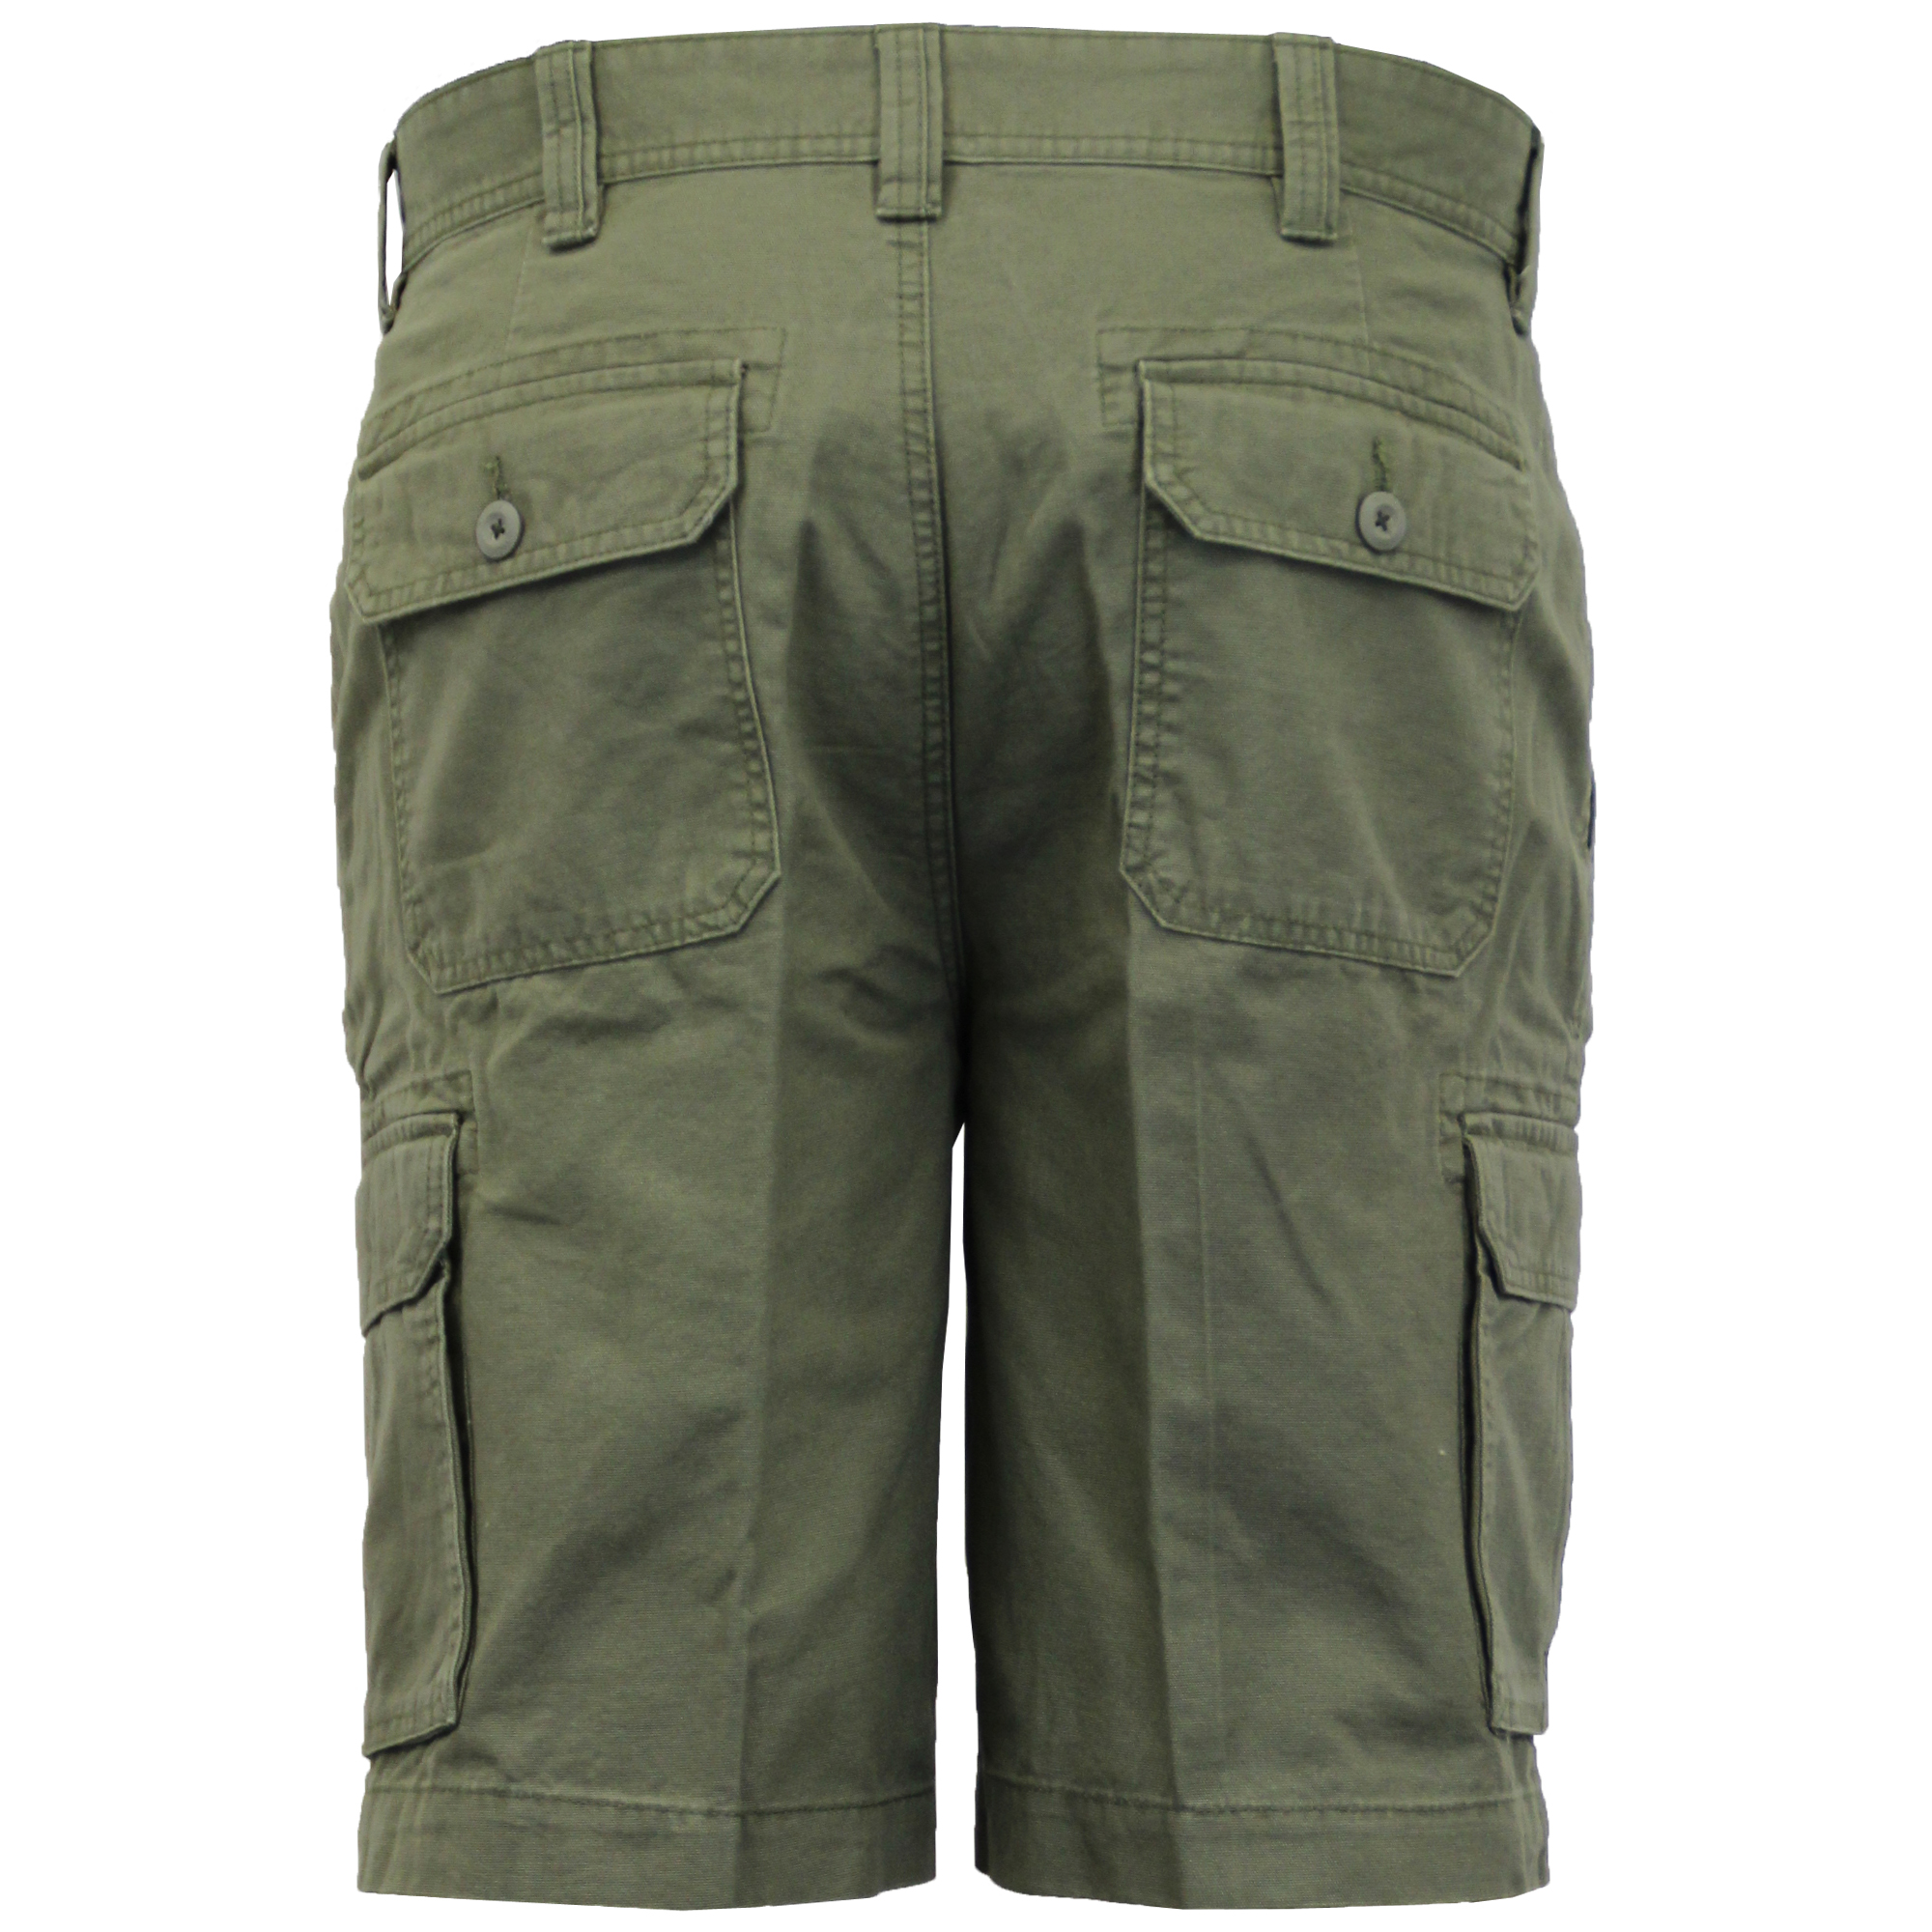 Mens-Cargo-Chino-Shorts-Threadbare-Combat-Knee-Length-Westace-Military-Summer thumbnail 14